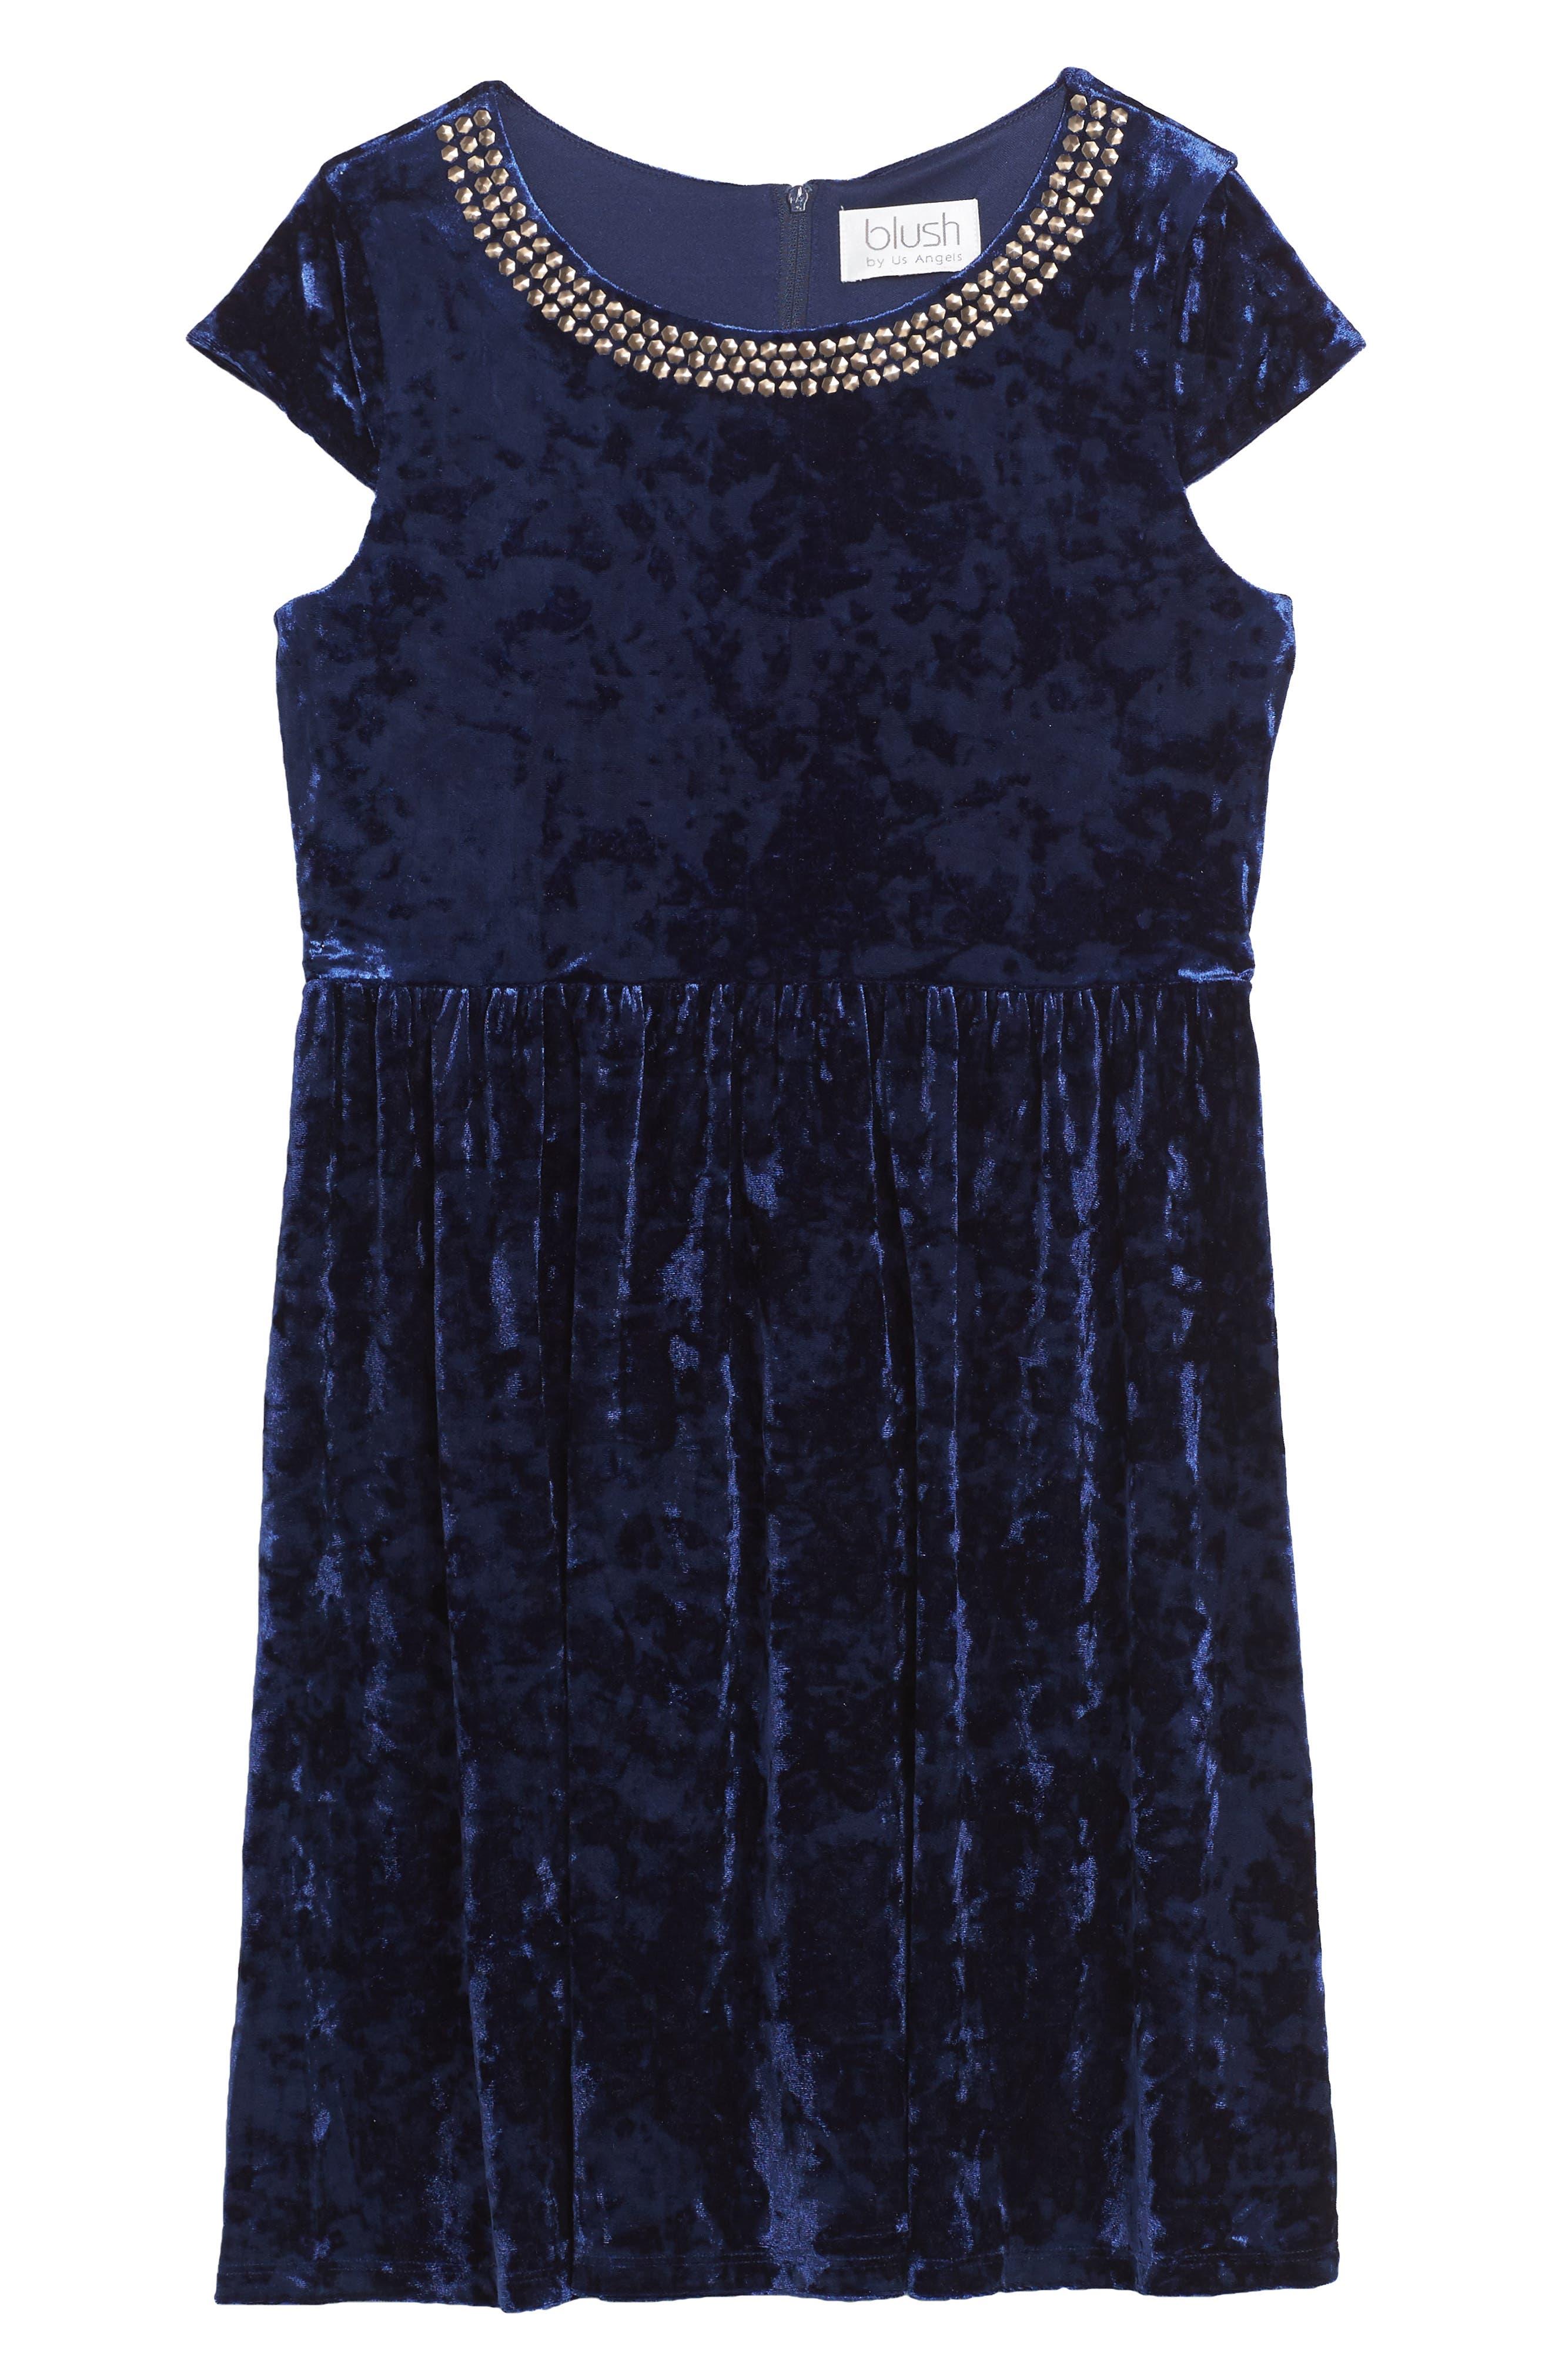 Alternate Image 1 Selected - BLUSH by Us Angels Velvet Dress (Big Girls)